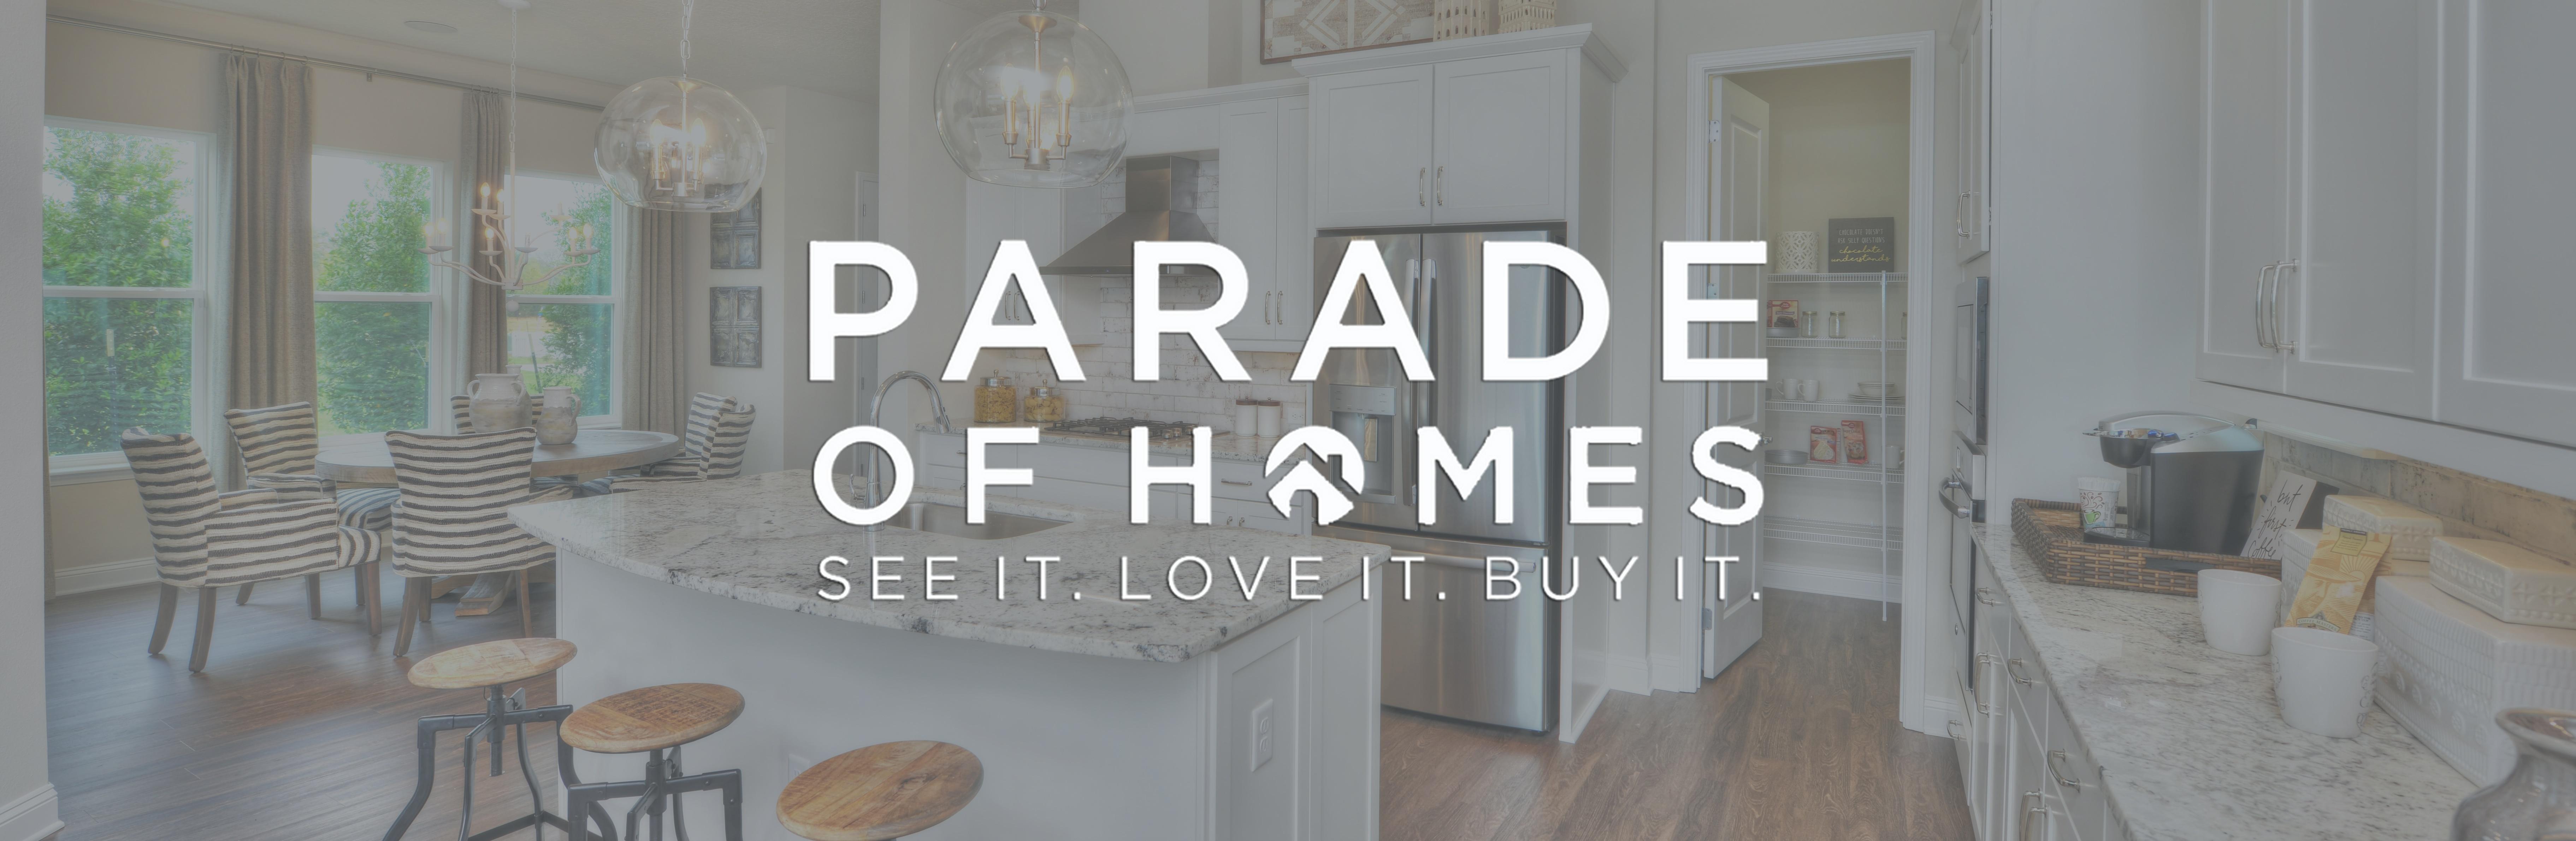 Parade of Homes.jpg